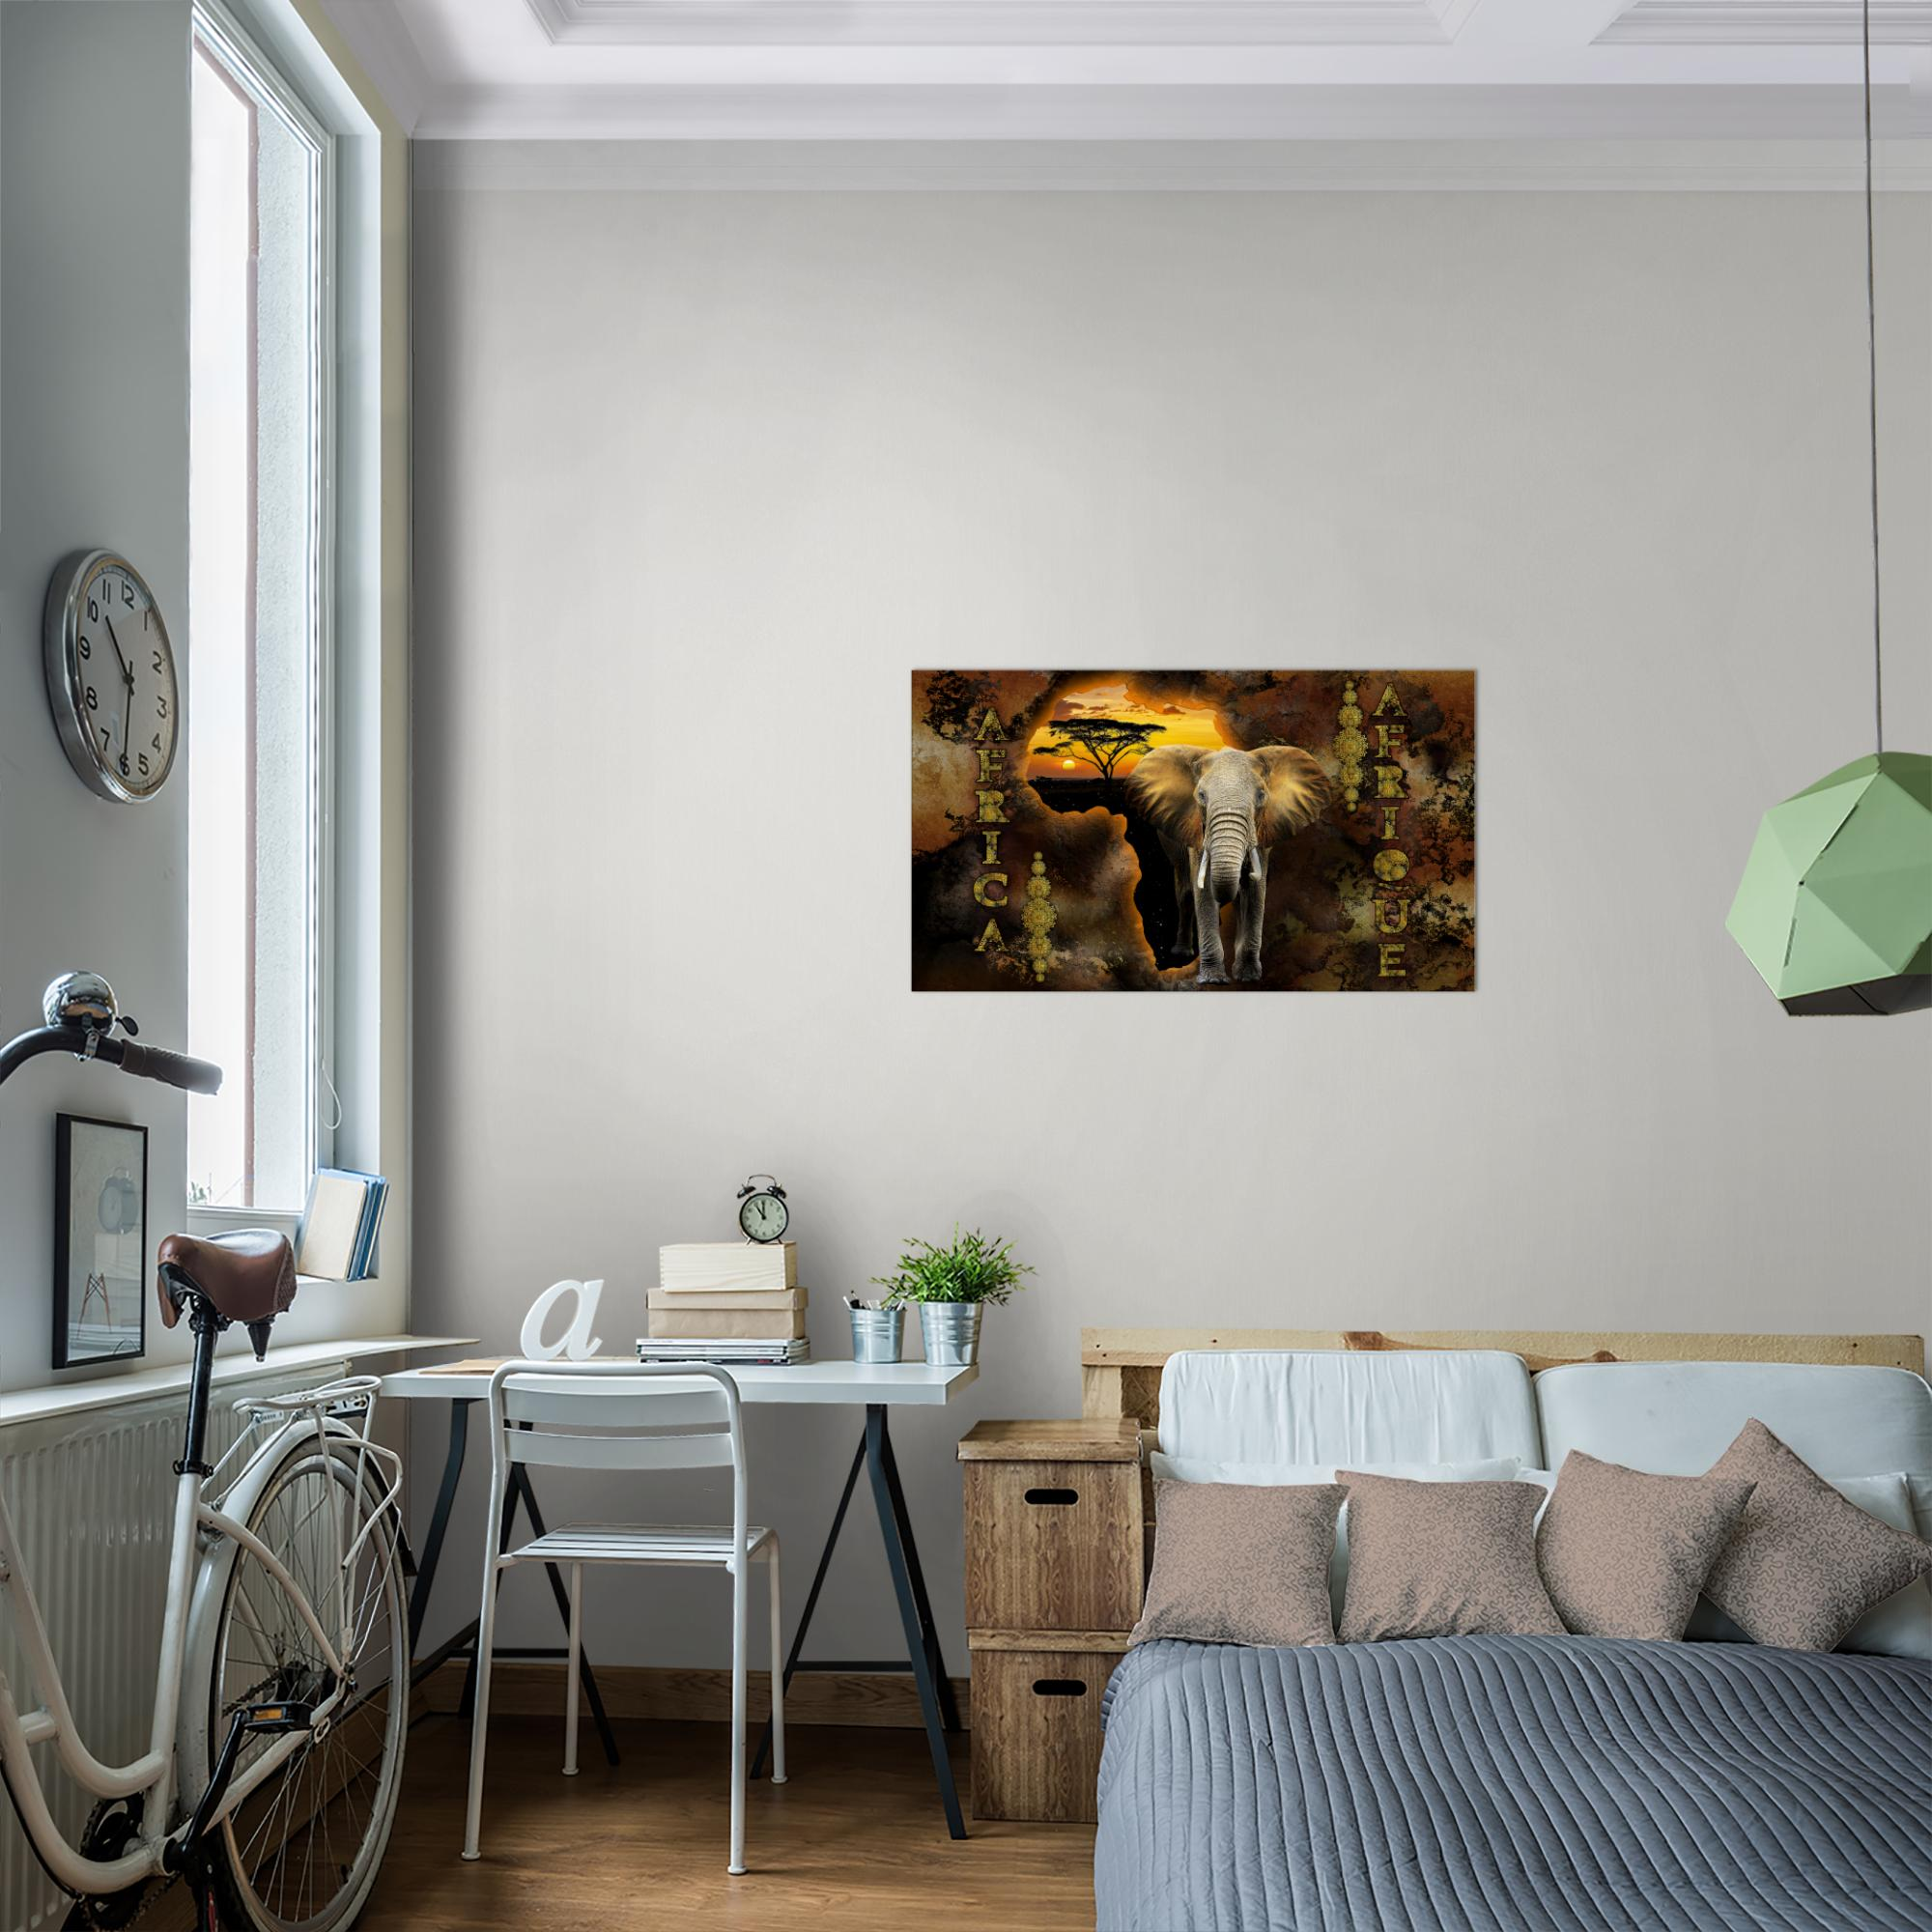 Afrika bild kunstdruck auf vlies leinwand xxl dekoration 022614p - Dekoration afrika ...